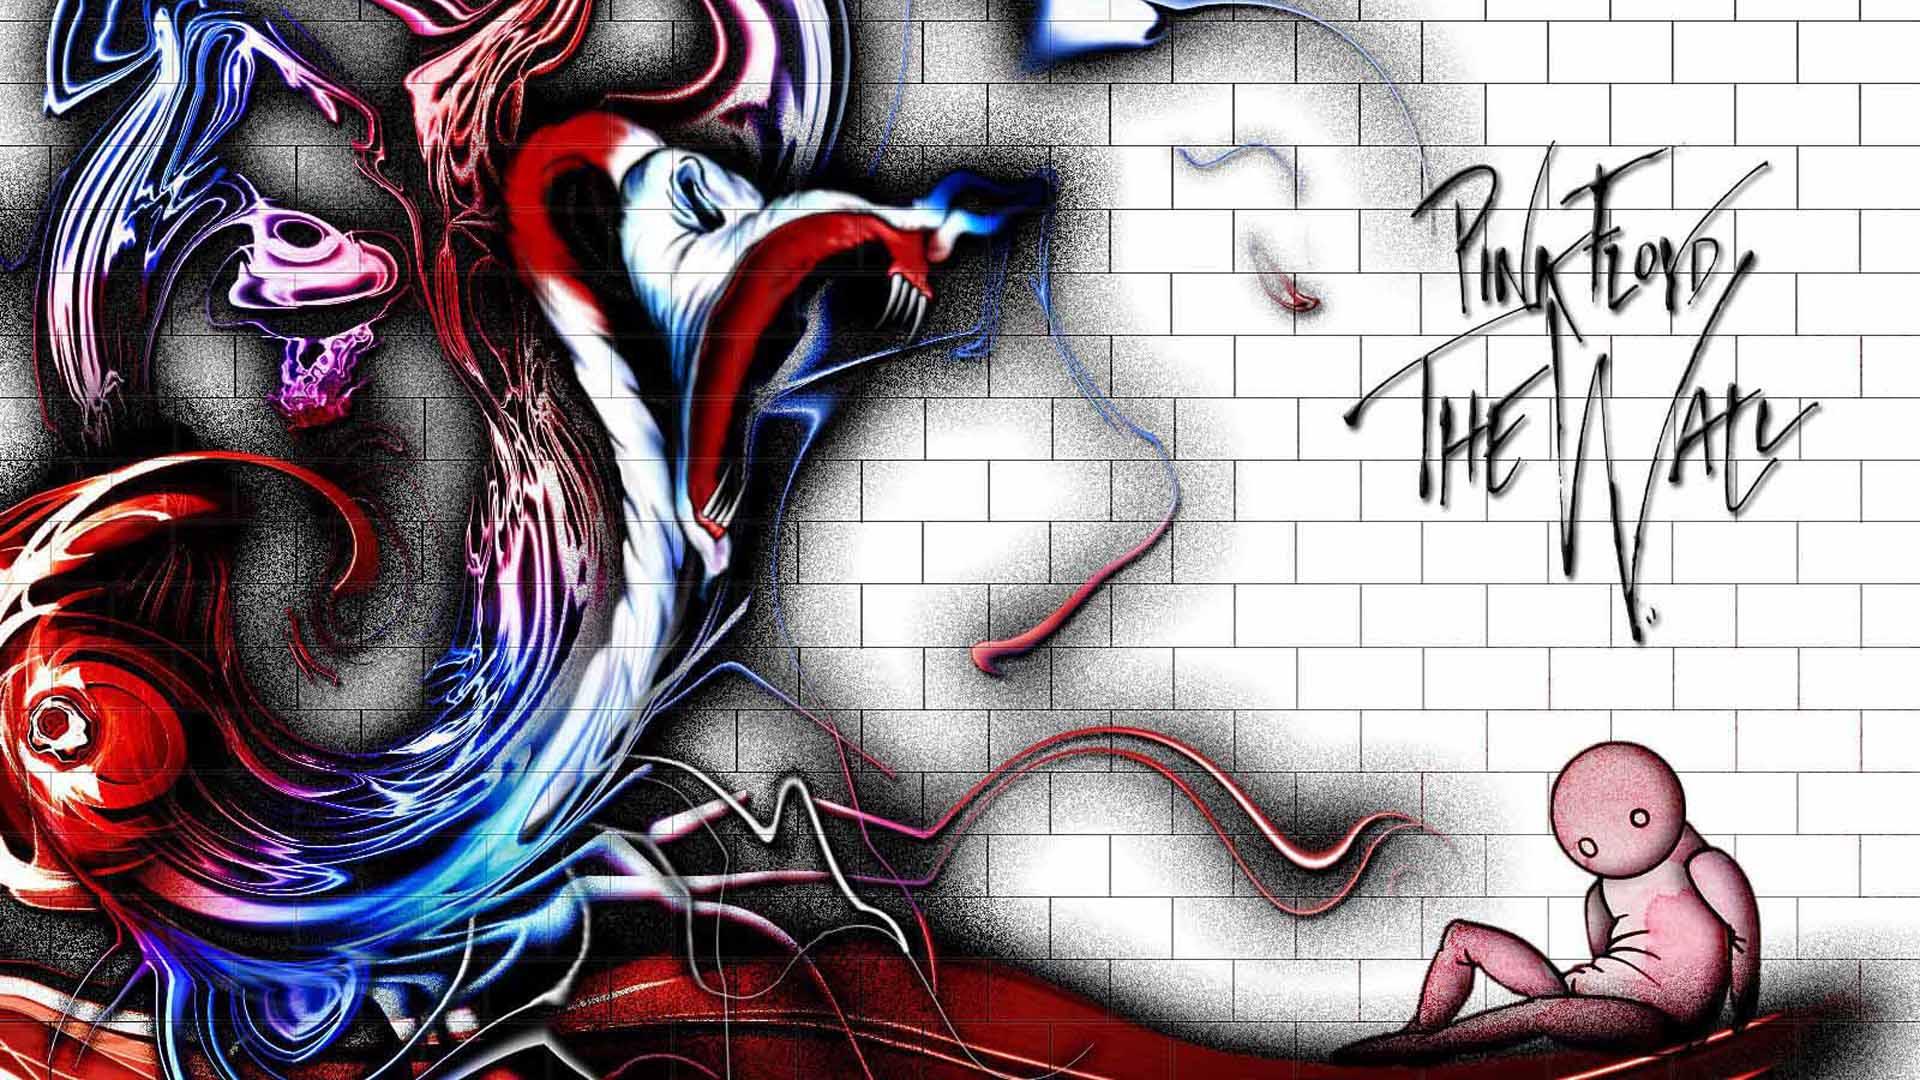 Pink Floyd Wallpapers - Wallpaper Cave